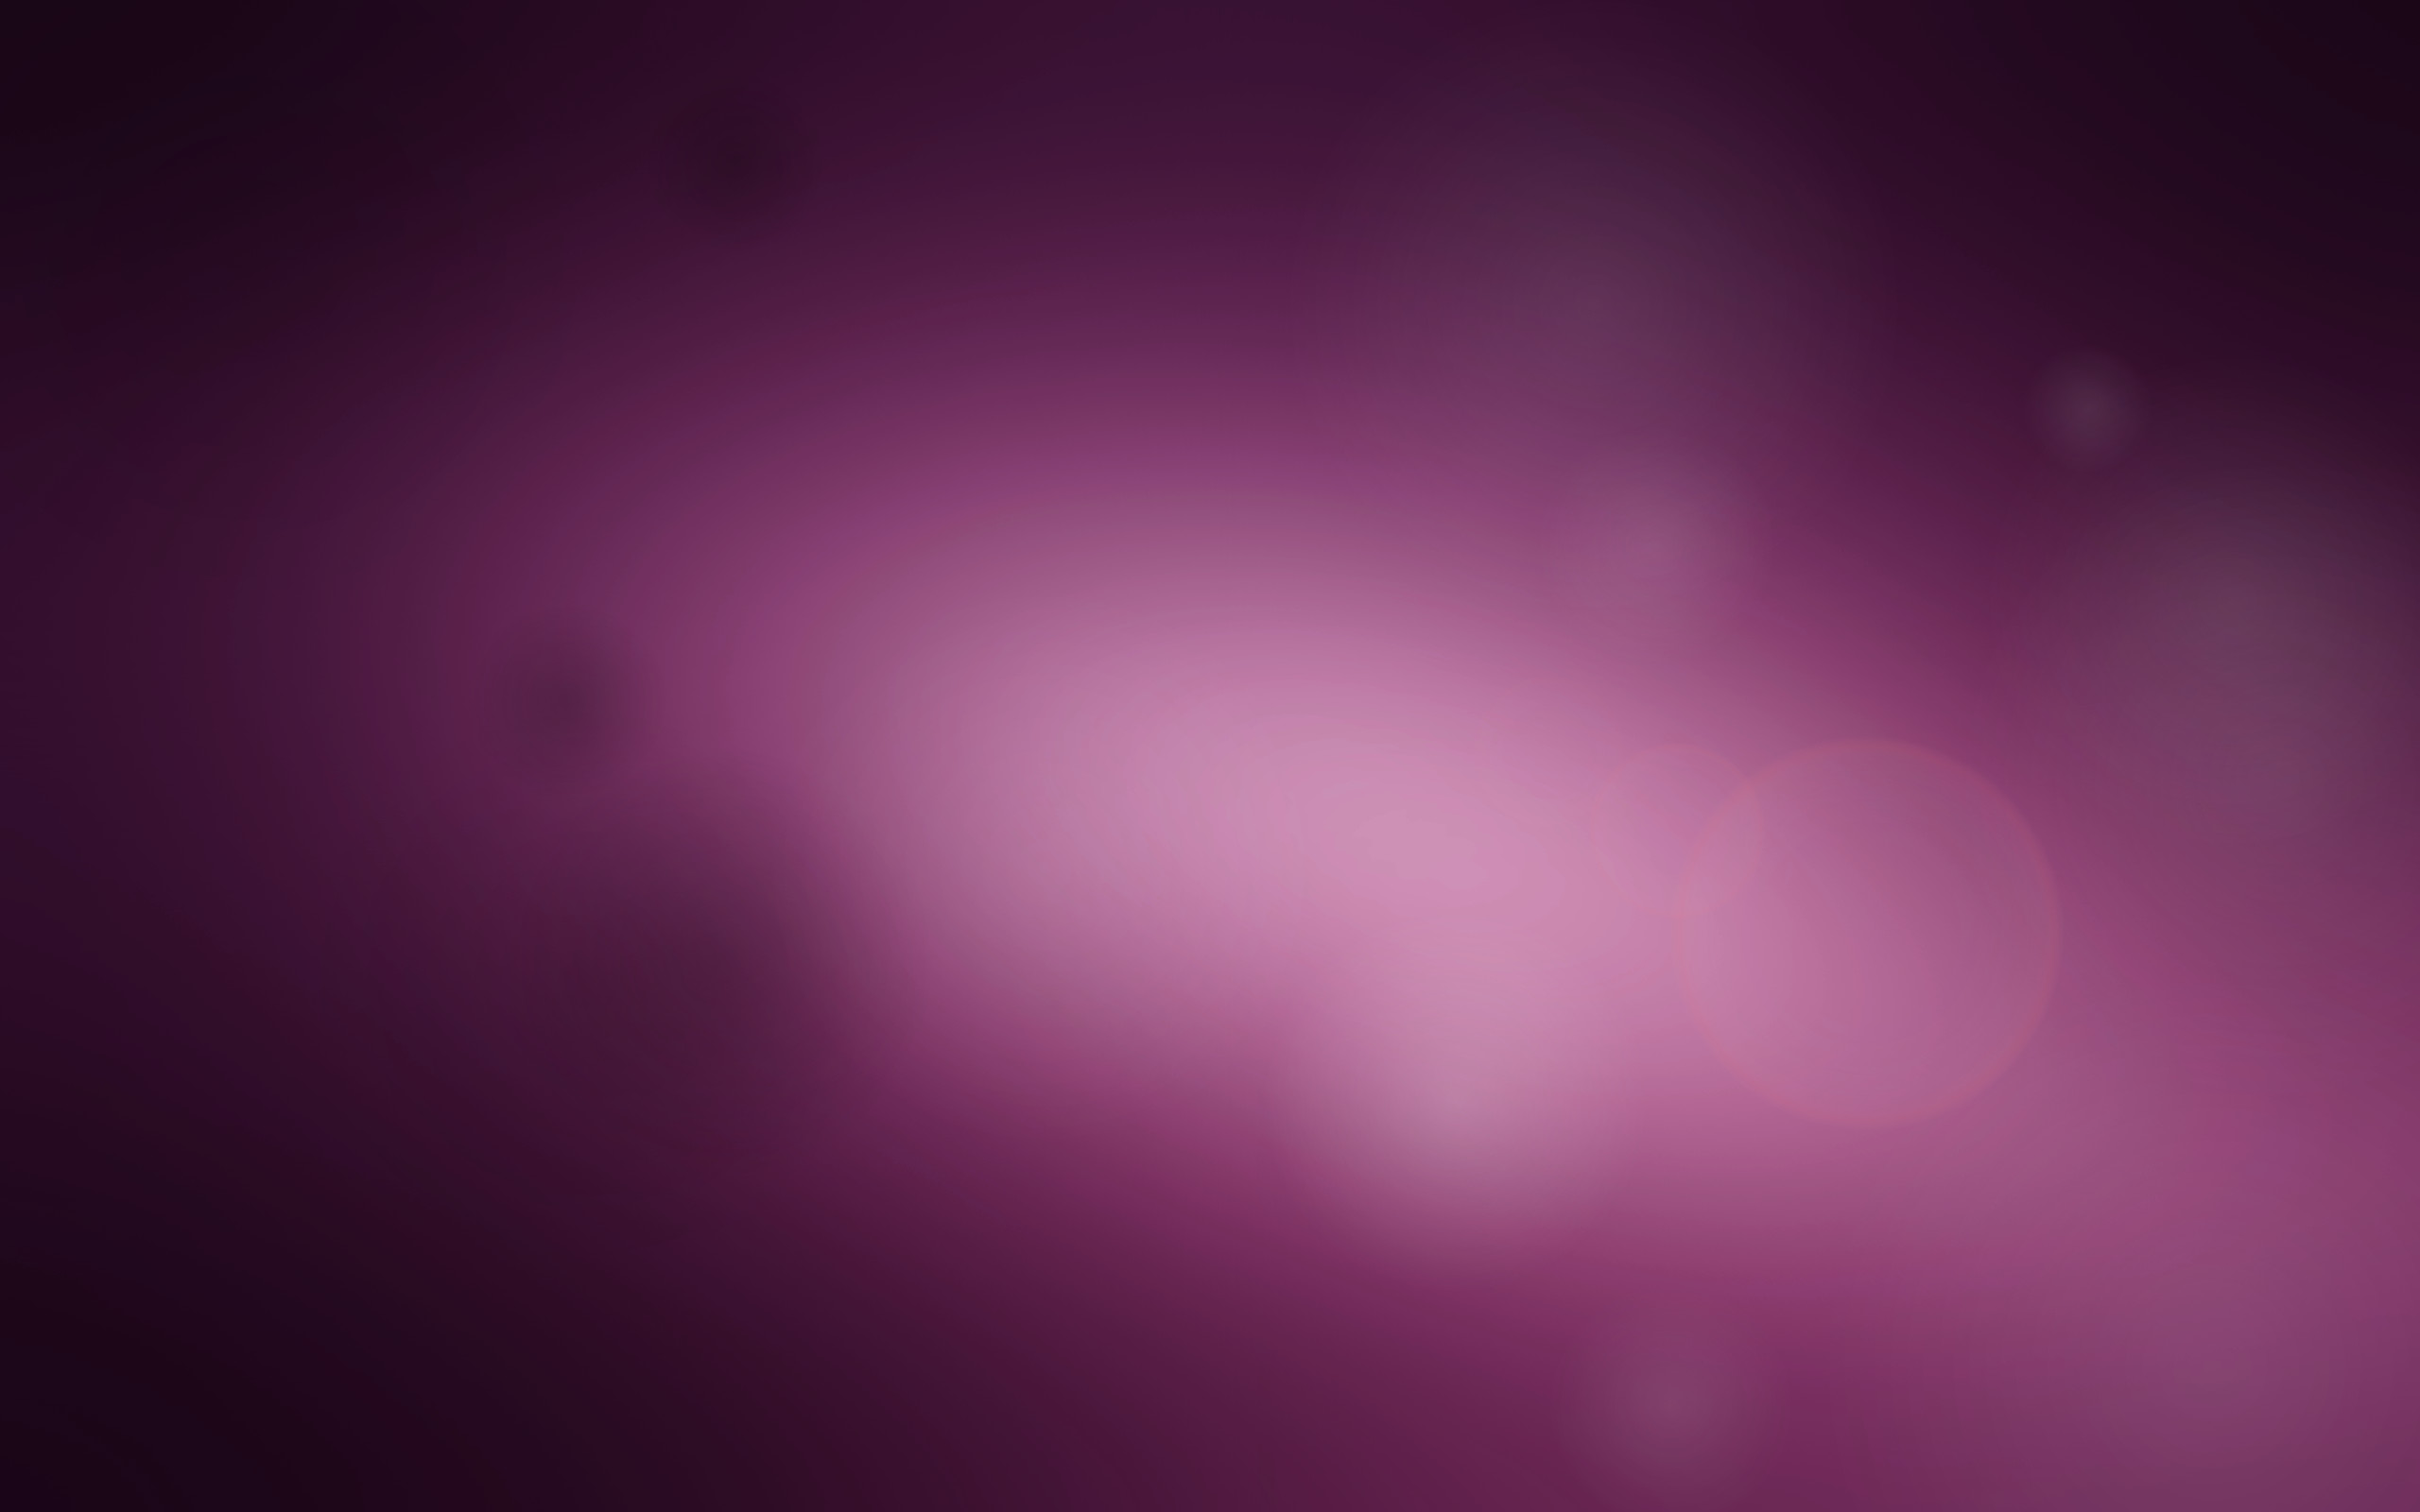 68 Color Gradient Wallpaper Hd